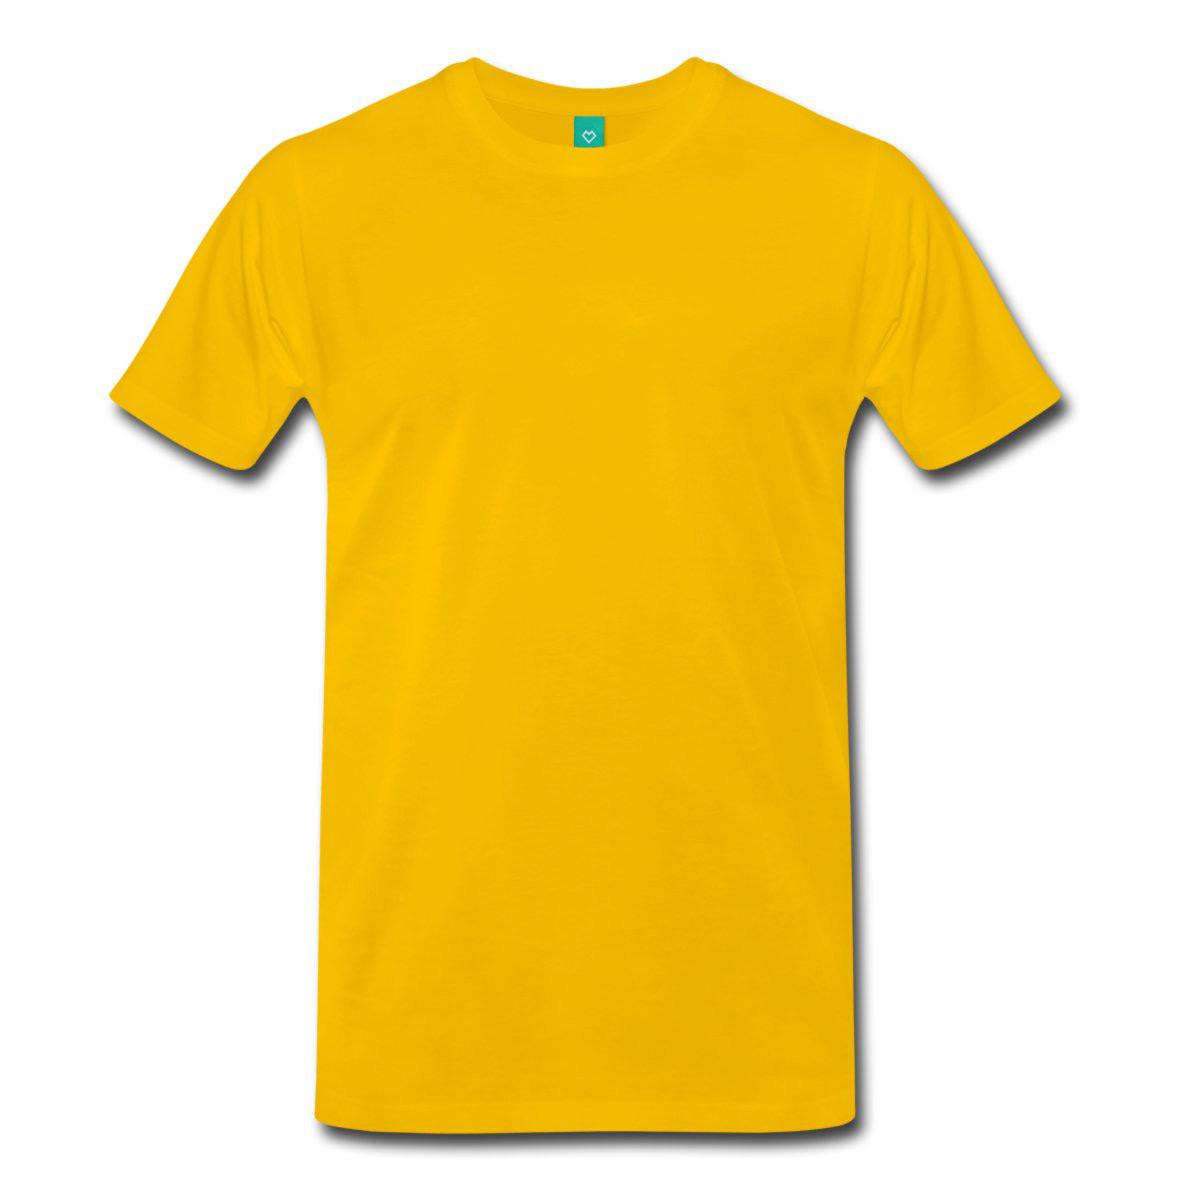 männer shirts bedrucken – herren t shirt gestalten